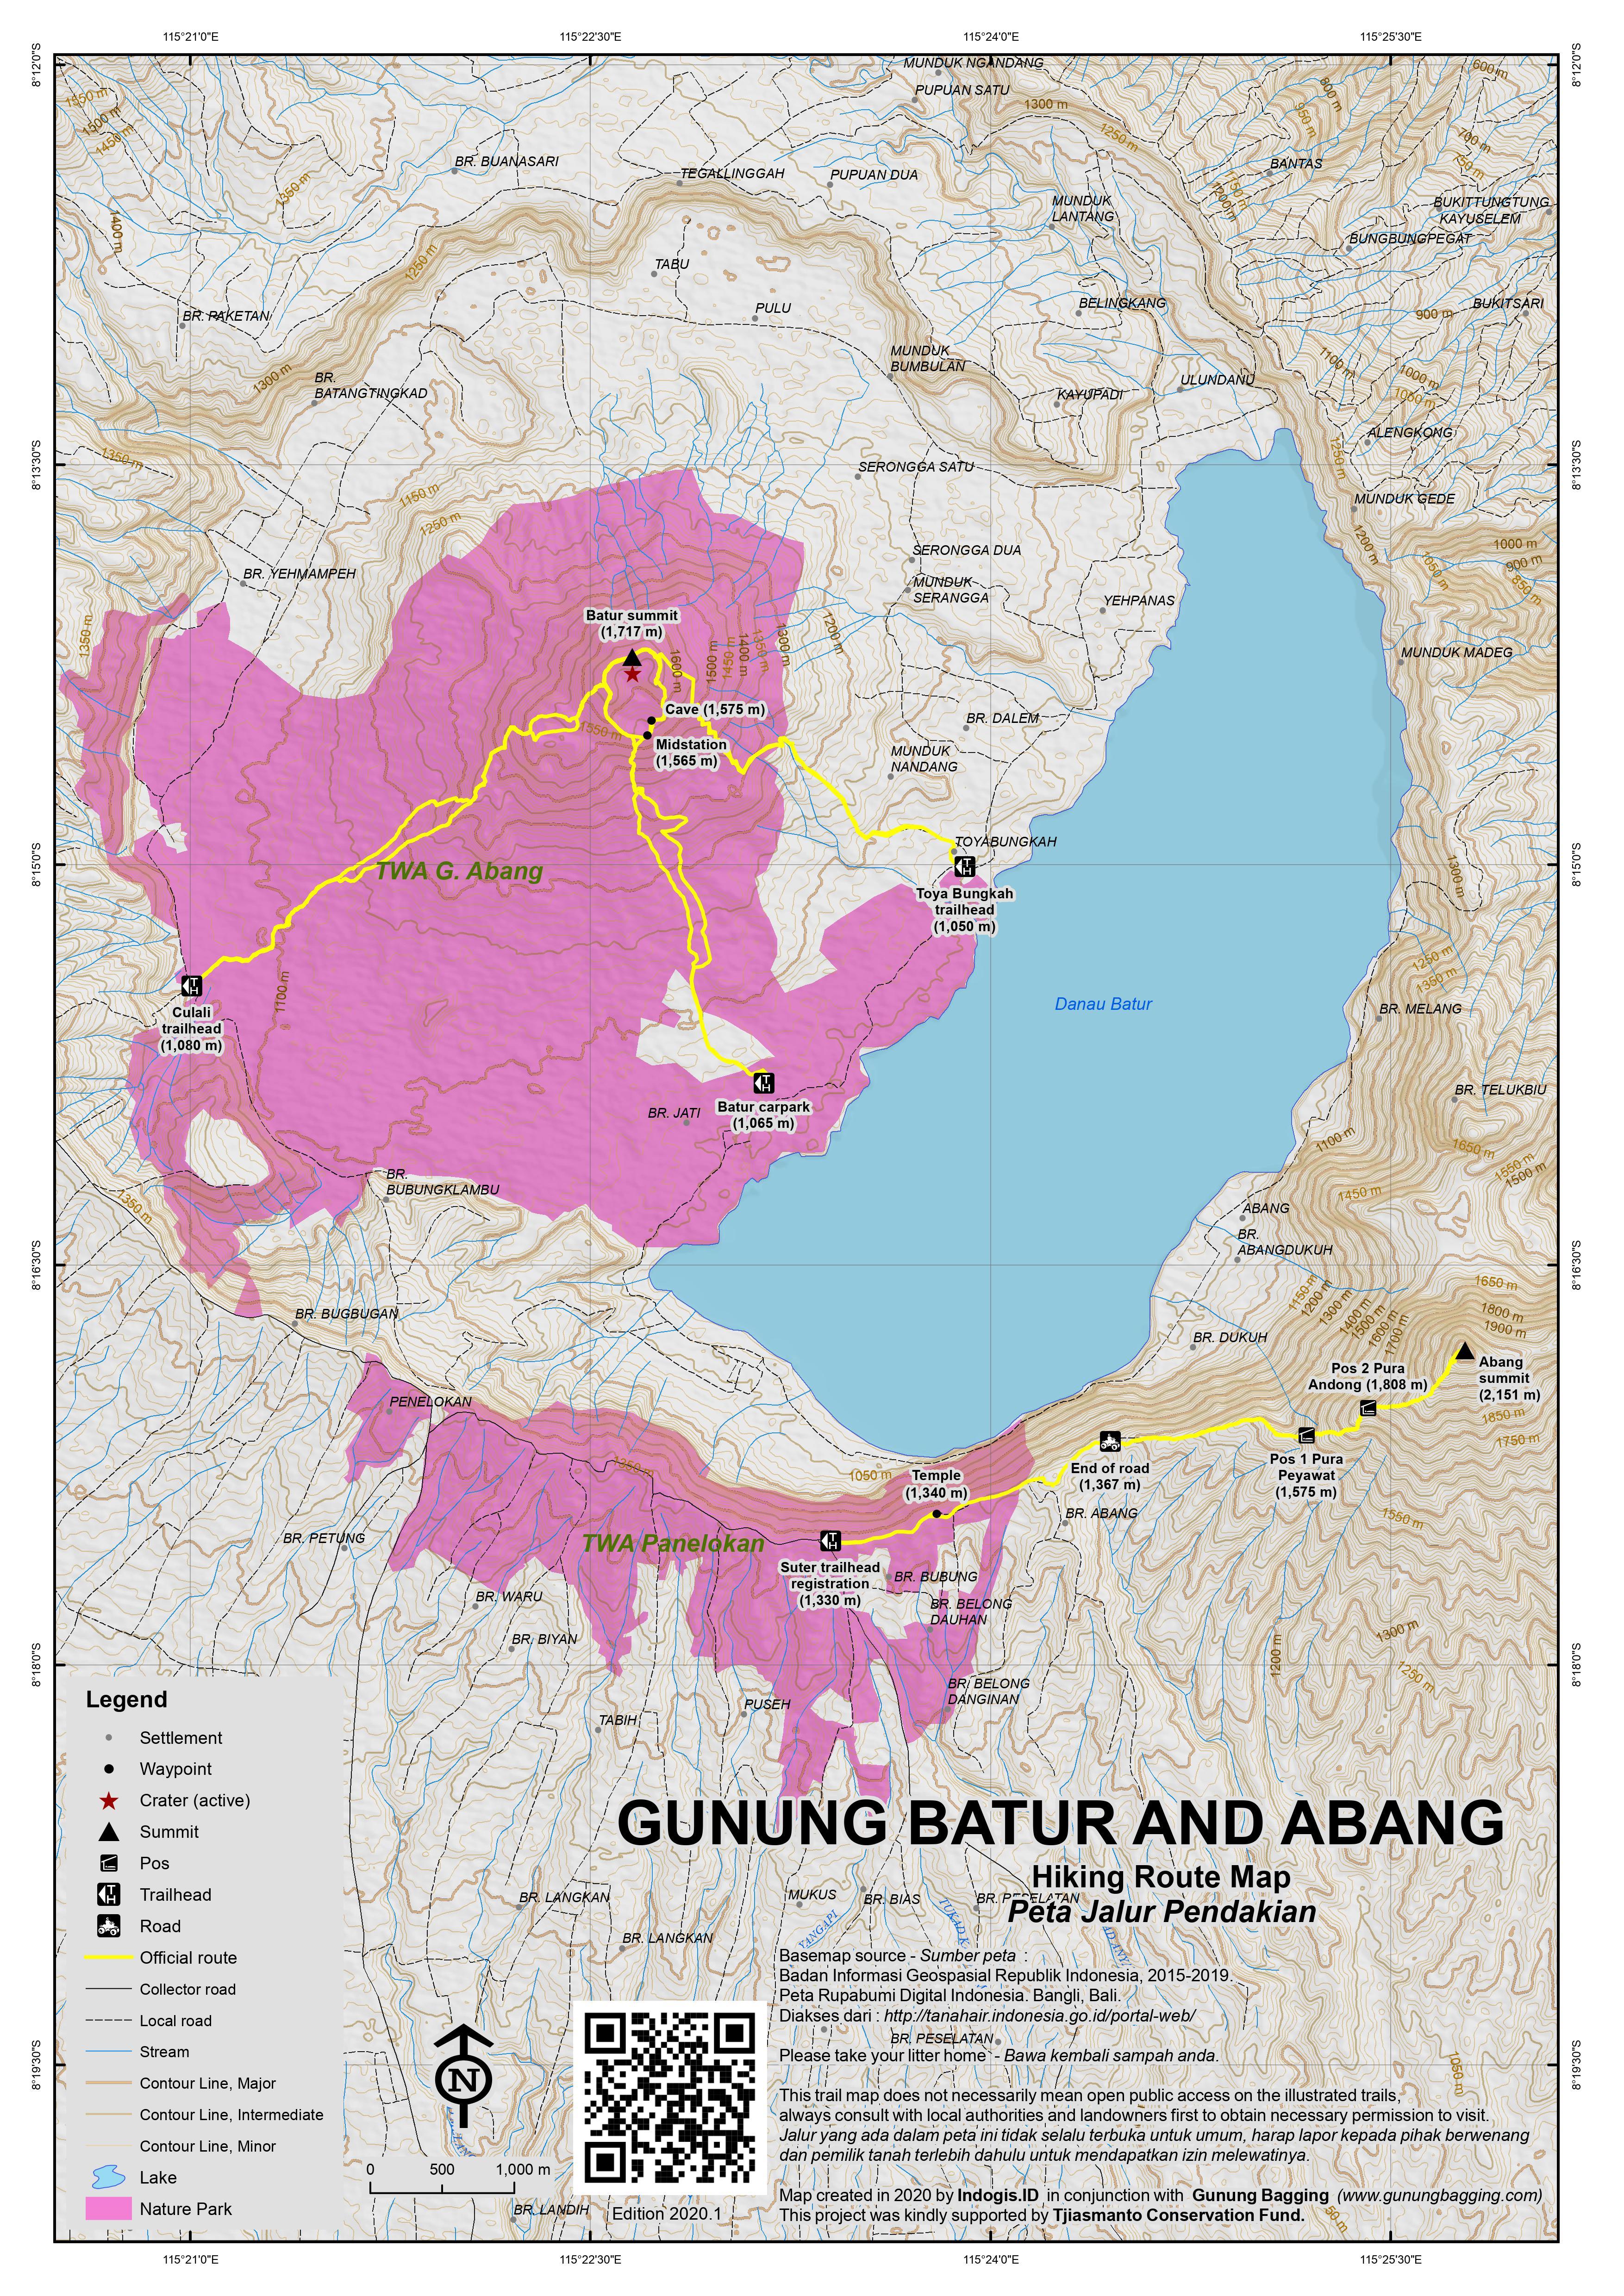 Peta Jalur Pendakian Gunung Batur and Abang